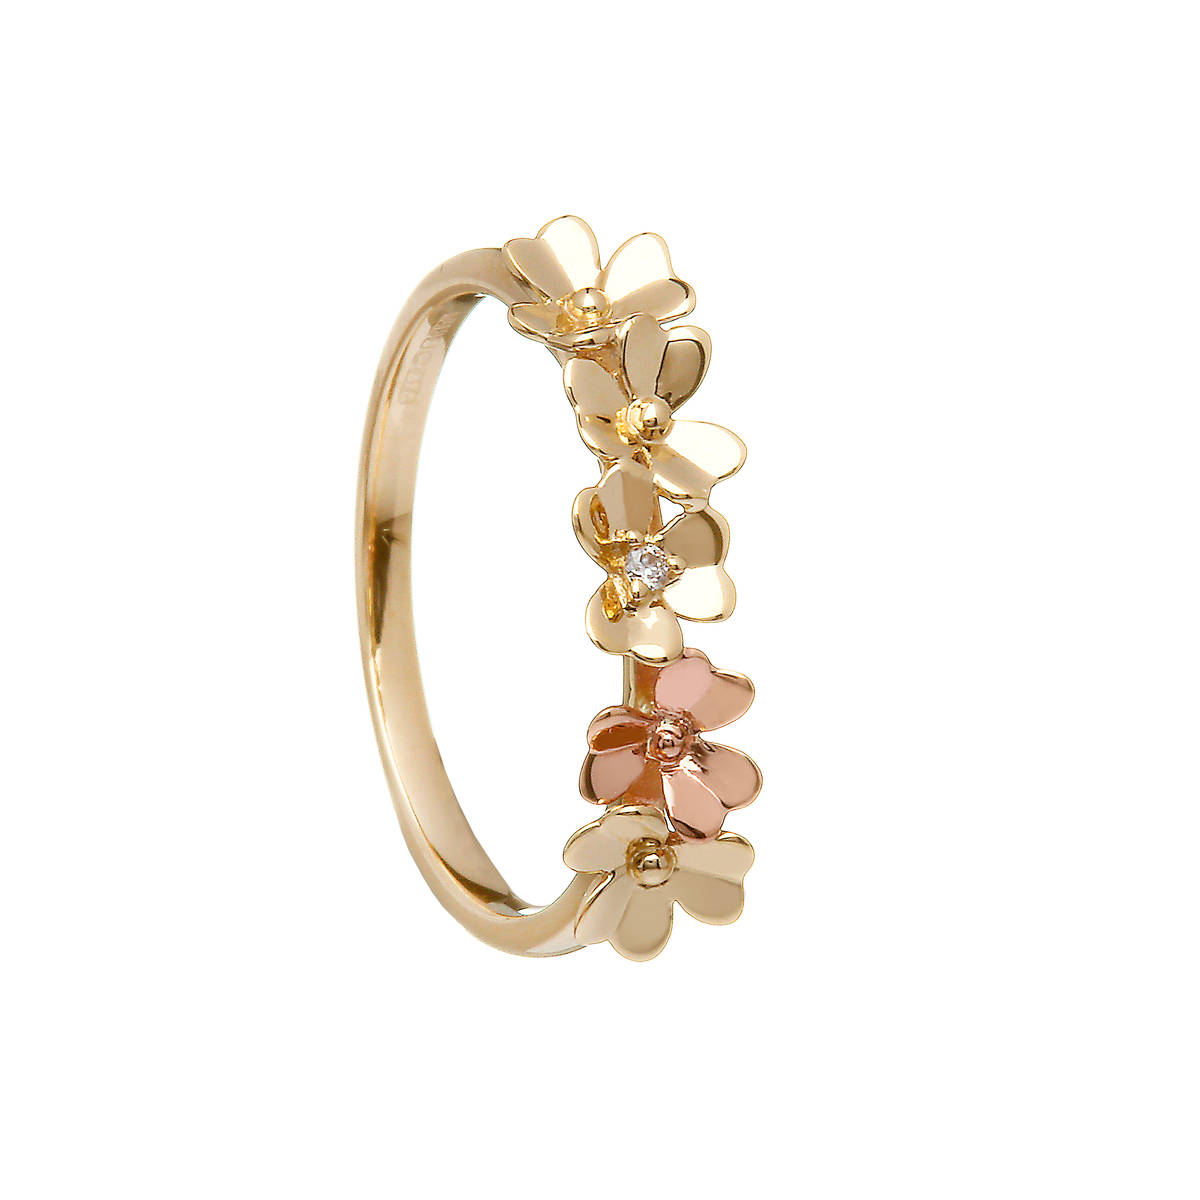 Diamond set 9 carat yellow gold shamrock ring with a single rose gold shamrock flower.